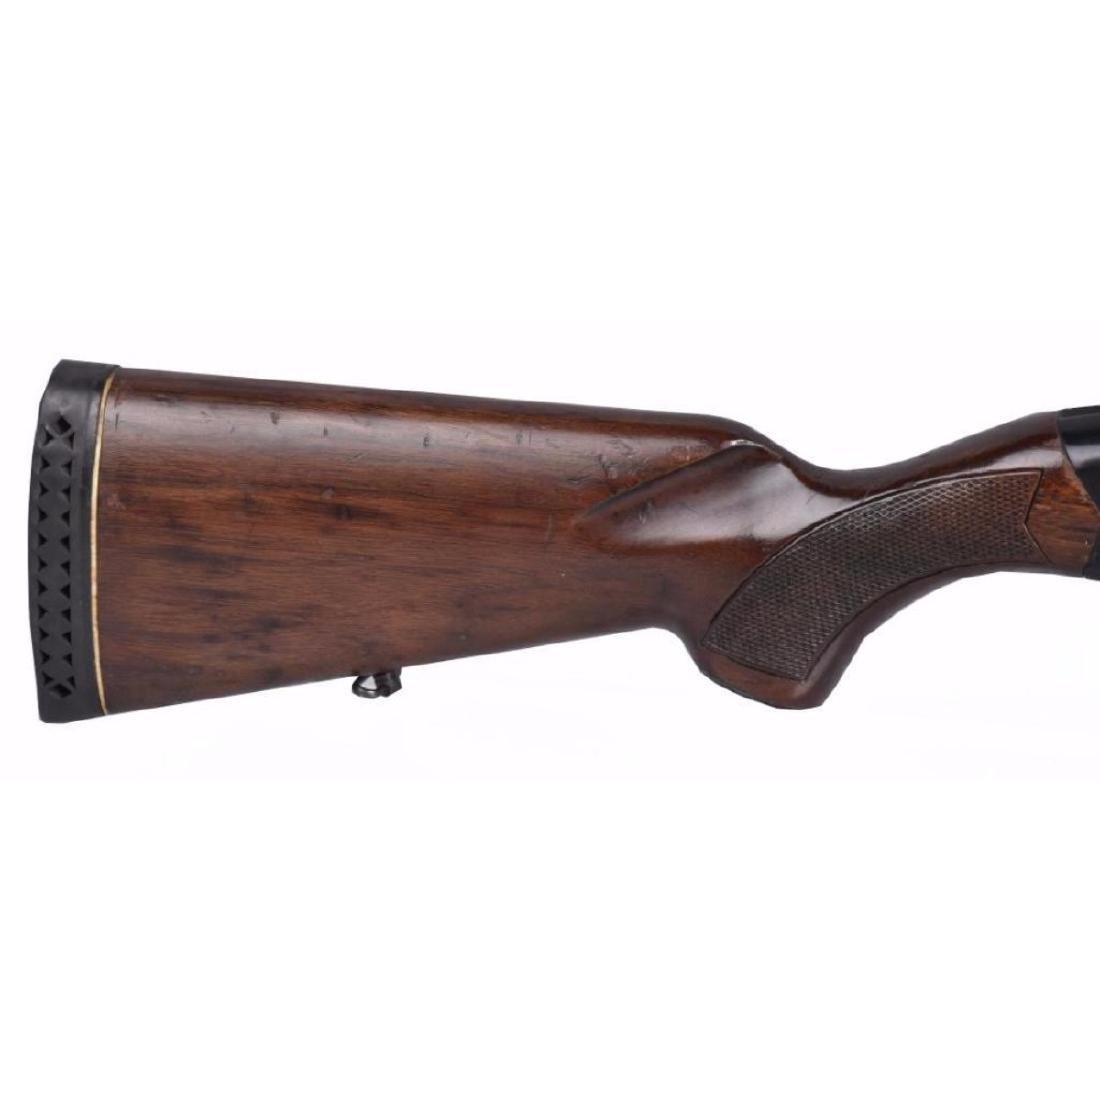 Winchester Model 1200 12 Ga Pump Shotgun - 3